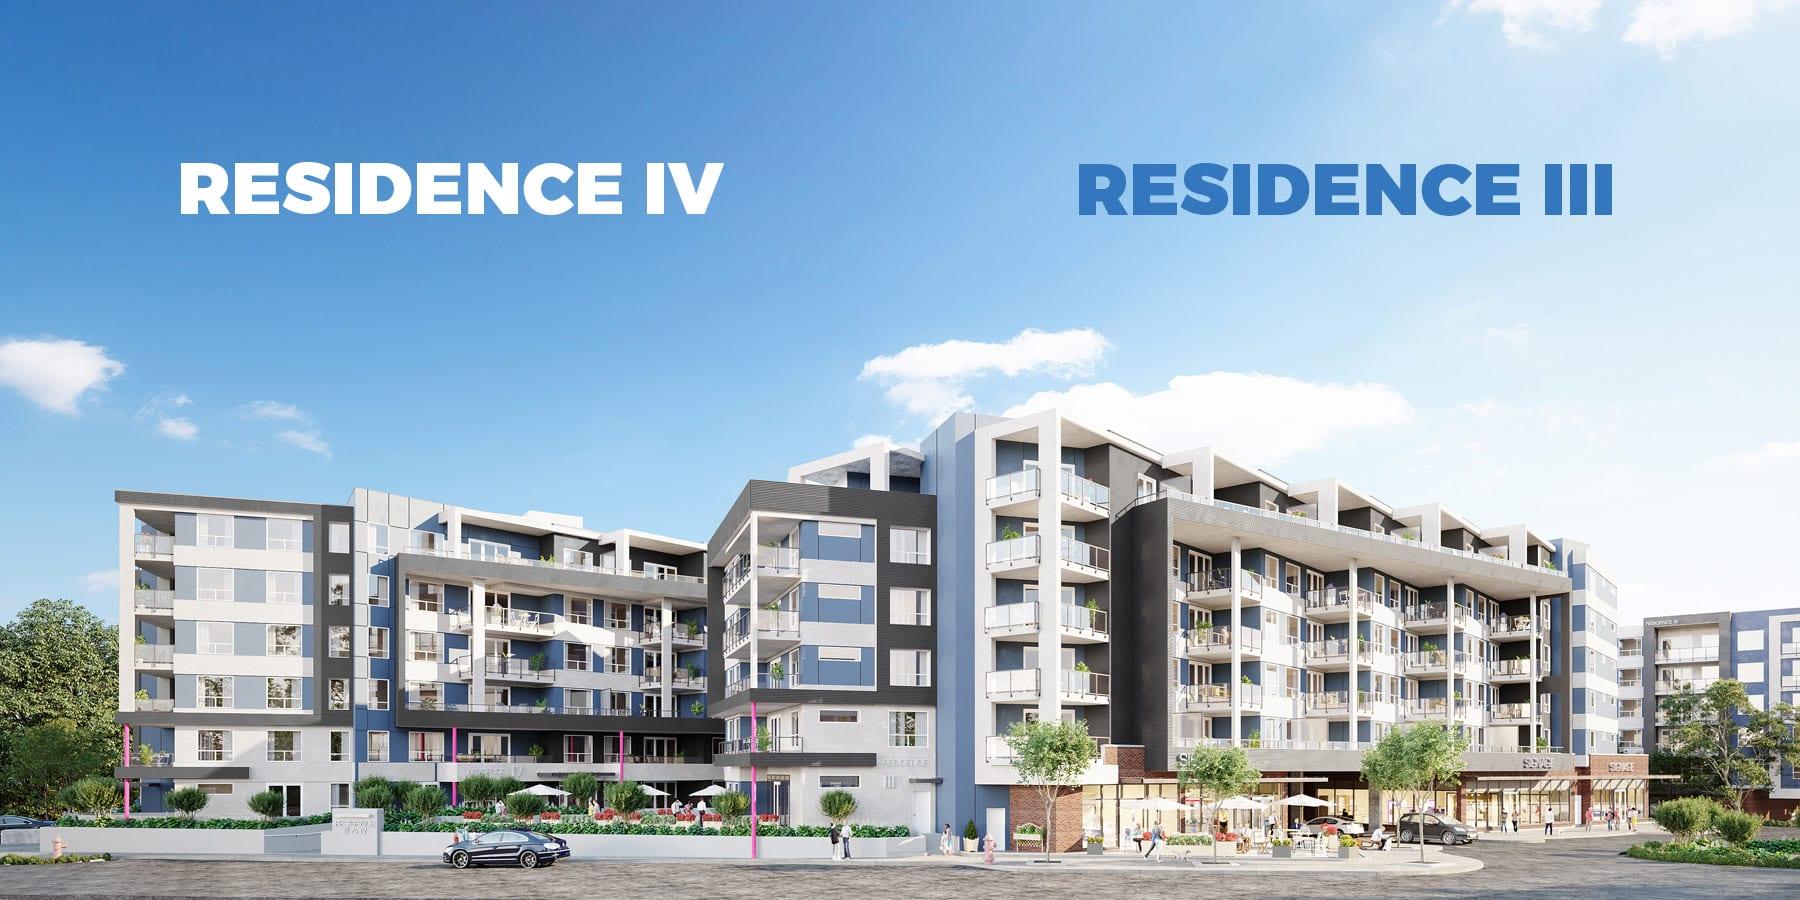 Residence IV and Residence III